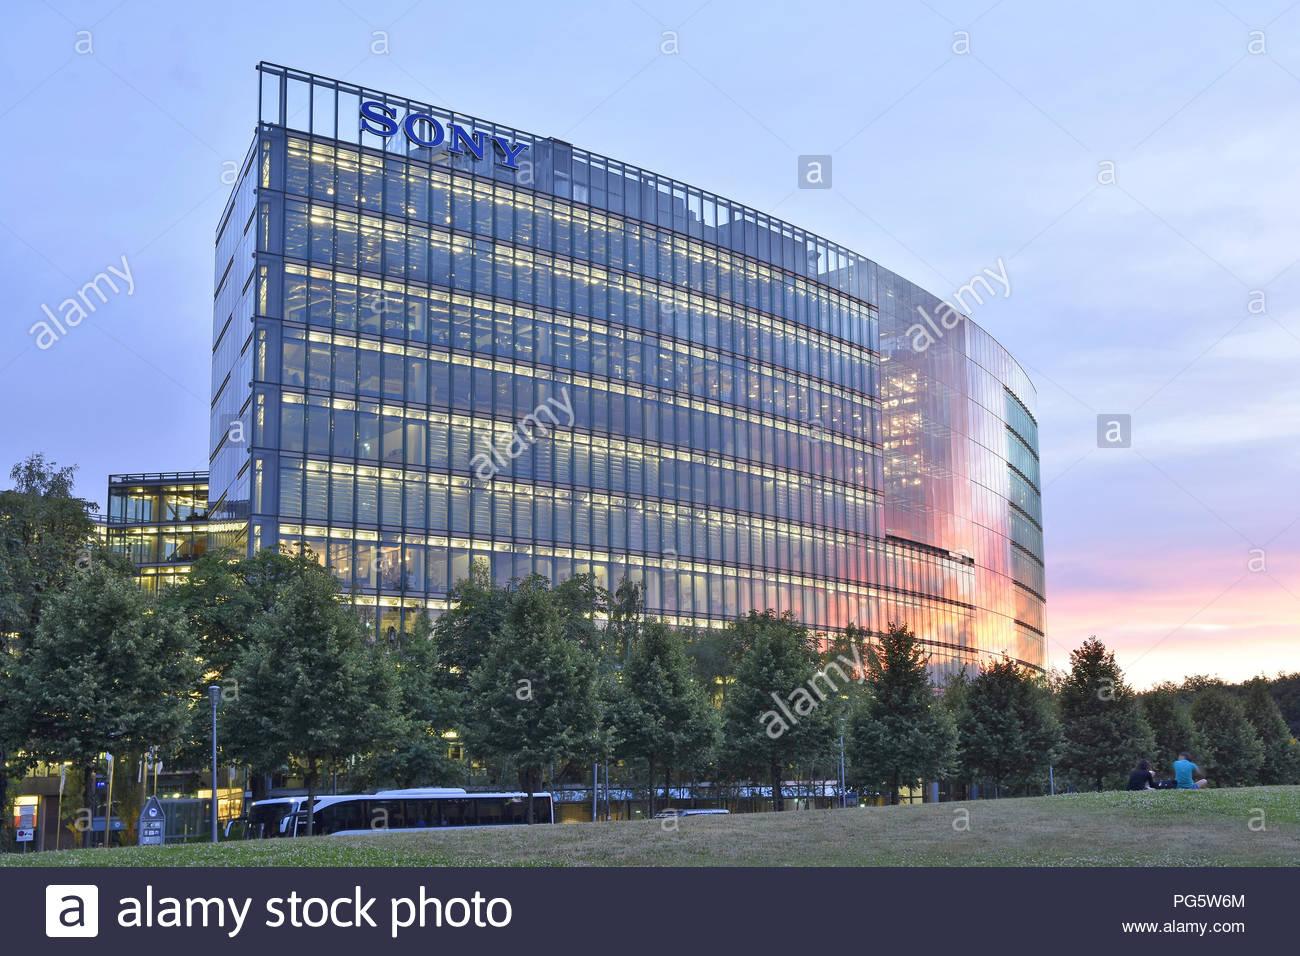 Modern Sony center building, glazed facade illuminated at dusk. Potsdamer Platz Berlin Germany Europe. - Stock Image